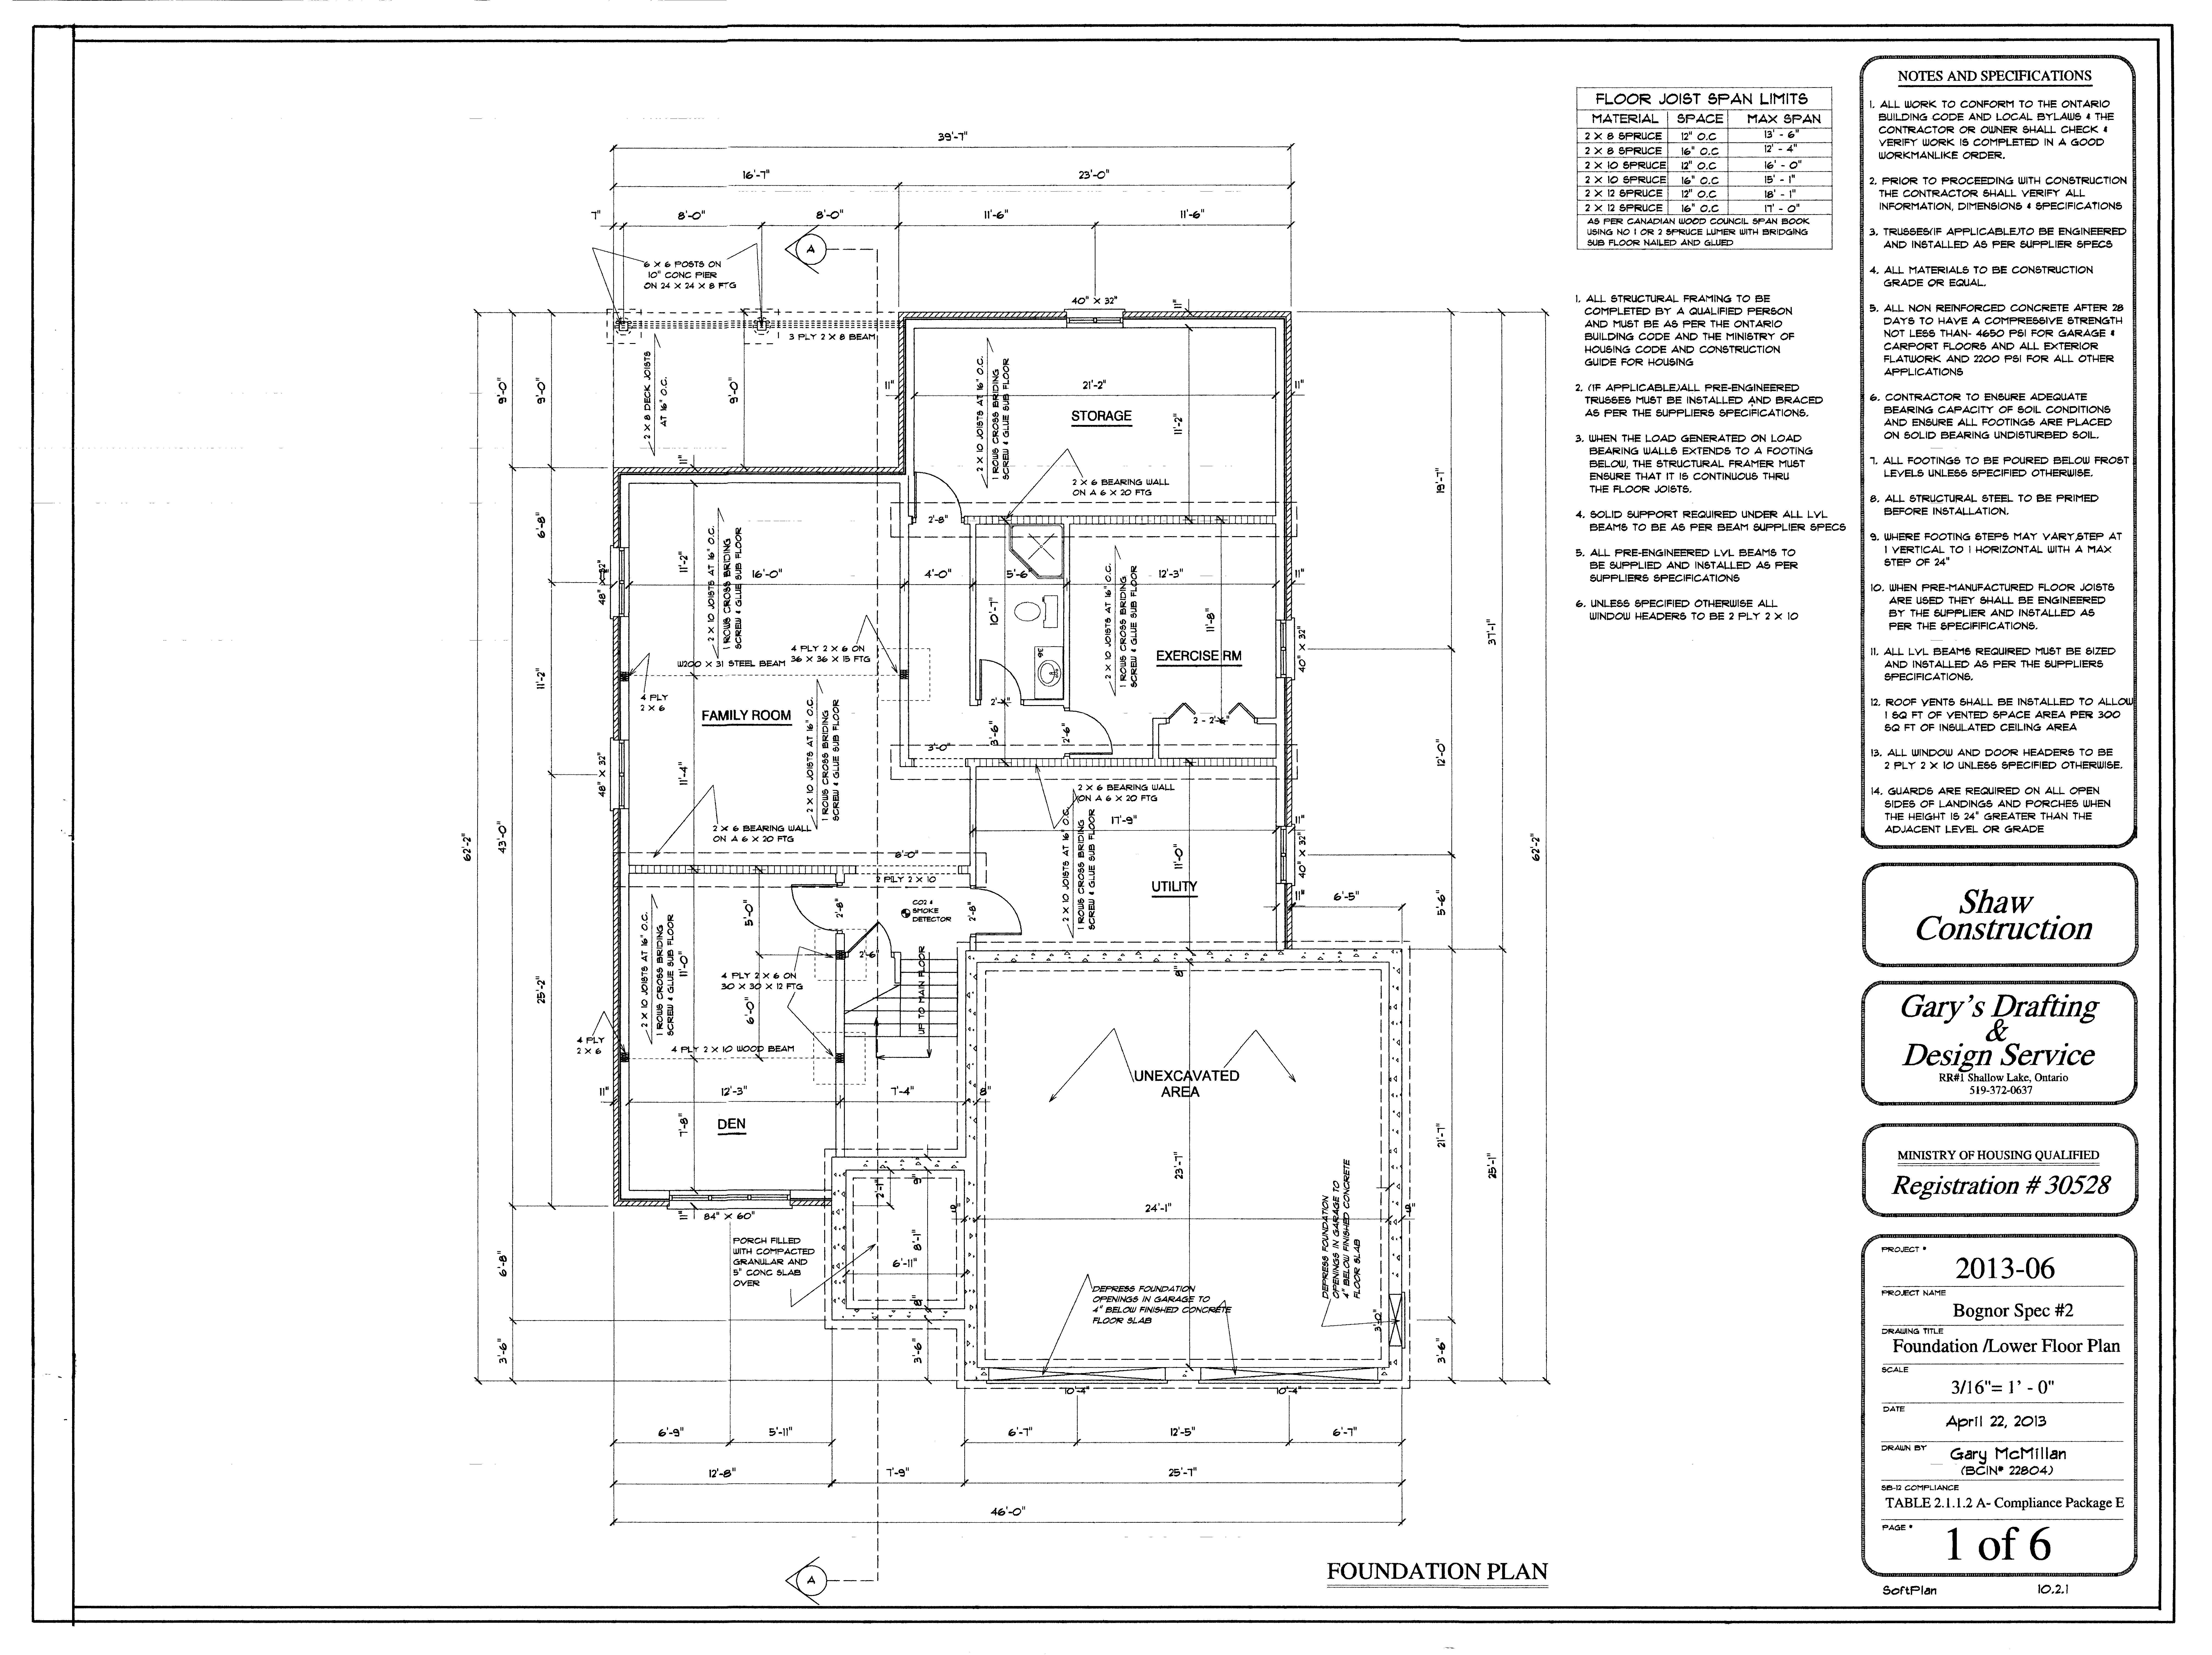 House Foundation Plan Home Building Plans Concrete Footing House Plans 156915